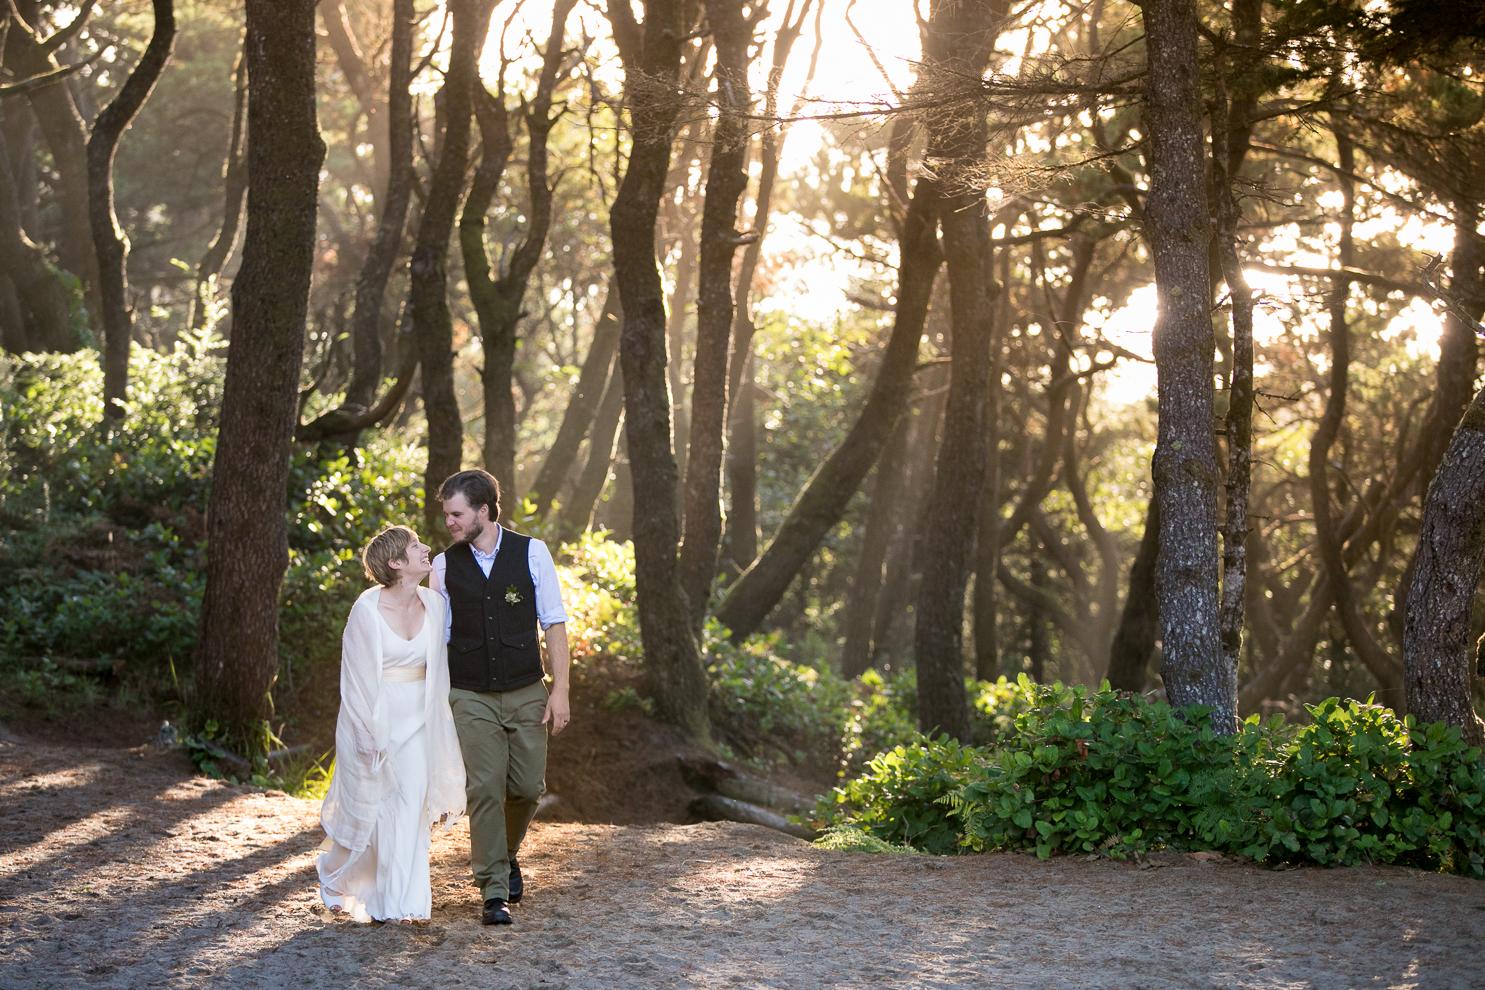 destination-wedding-photographer-oregon-coast-westwind-summer-camp-017.jpg